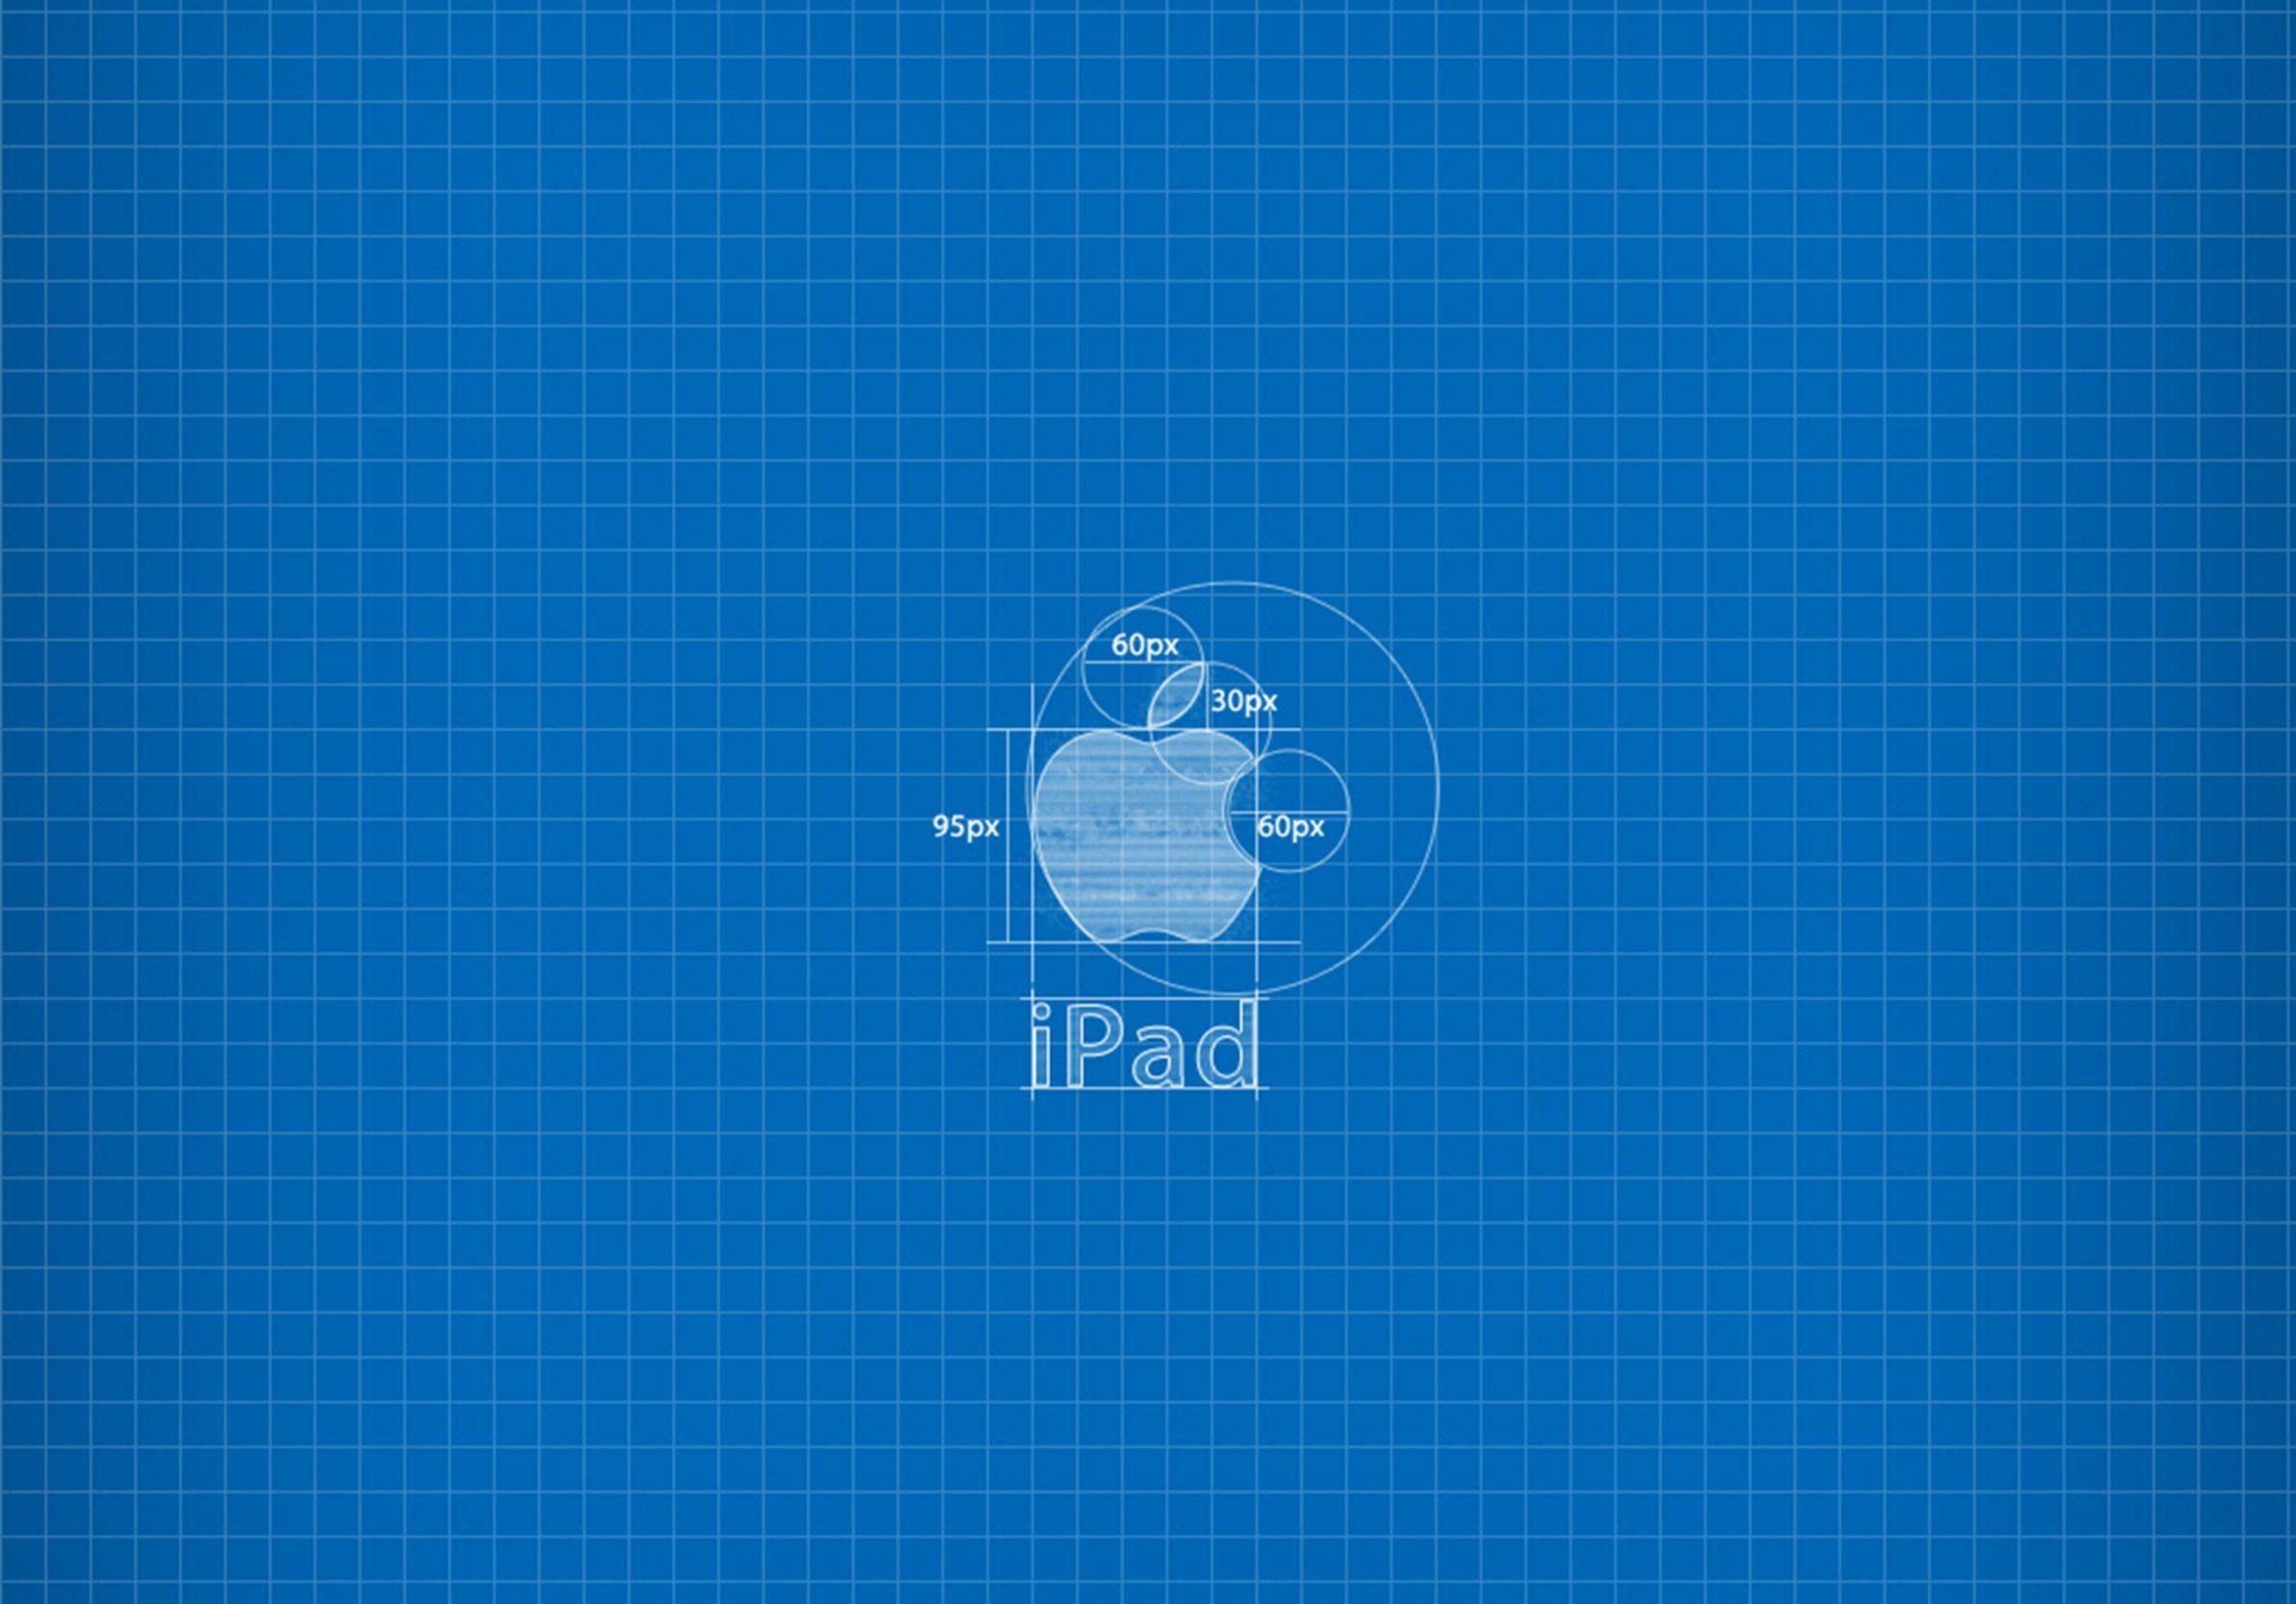 2388x1668 iPad Pro wallpapers Apple Blueprint Ipad Wallpaper 2388x1668 pixels resolution